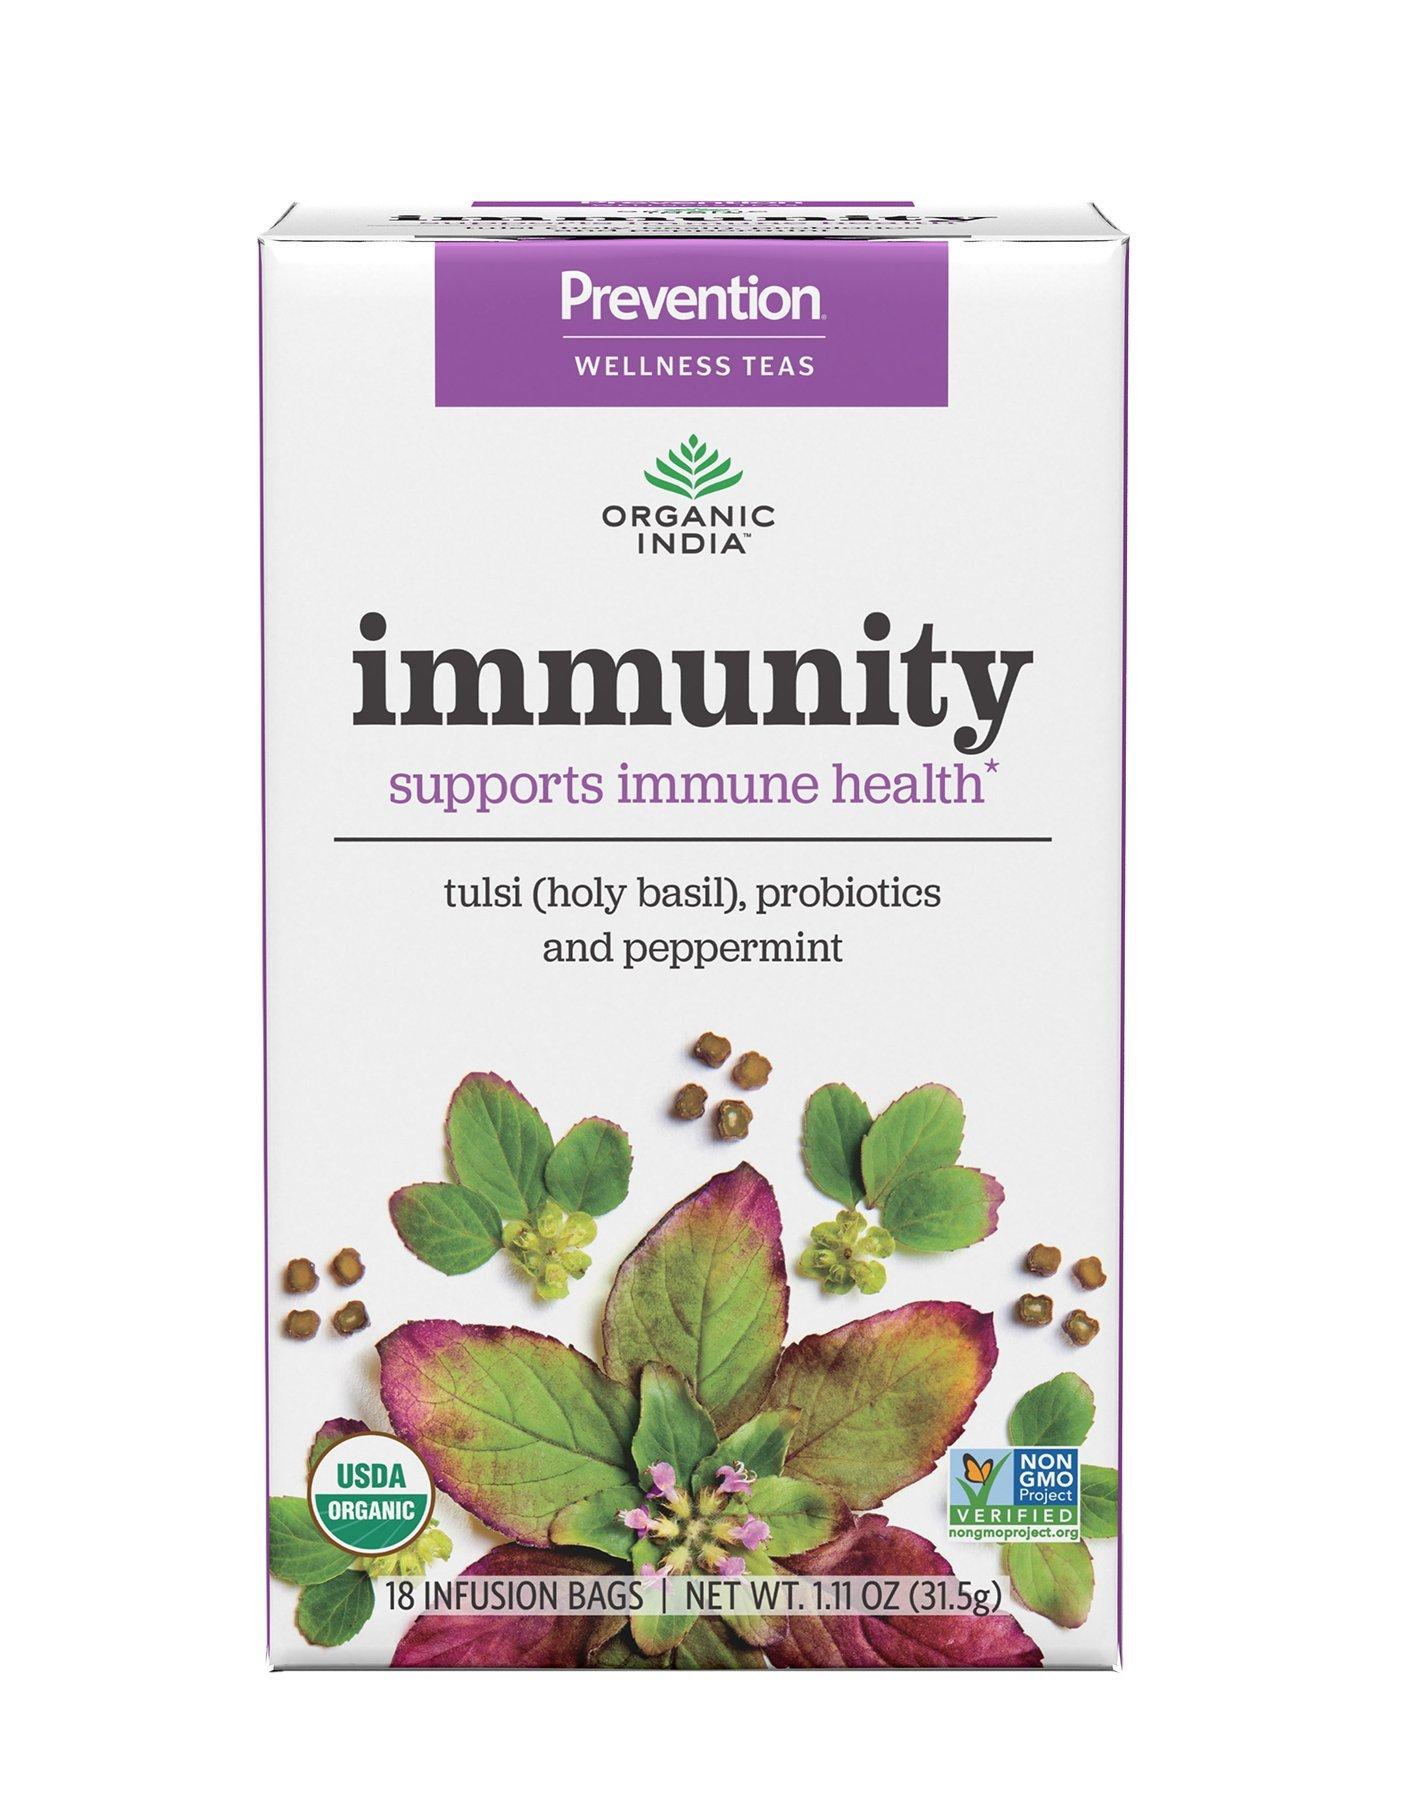 ORGANIC INDIA Prevention Wellness Teas - Immunity, 6 Pack Case